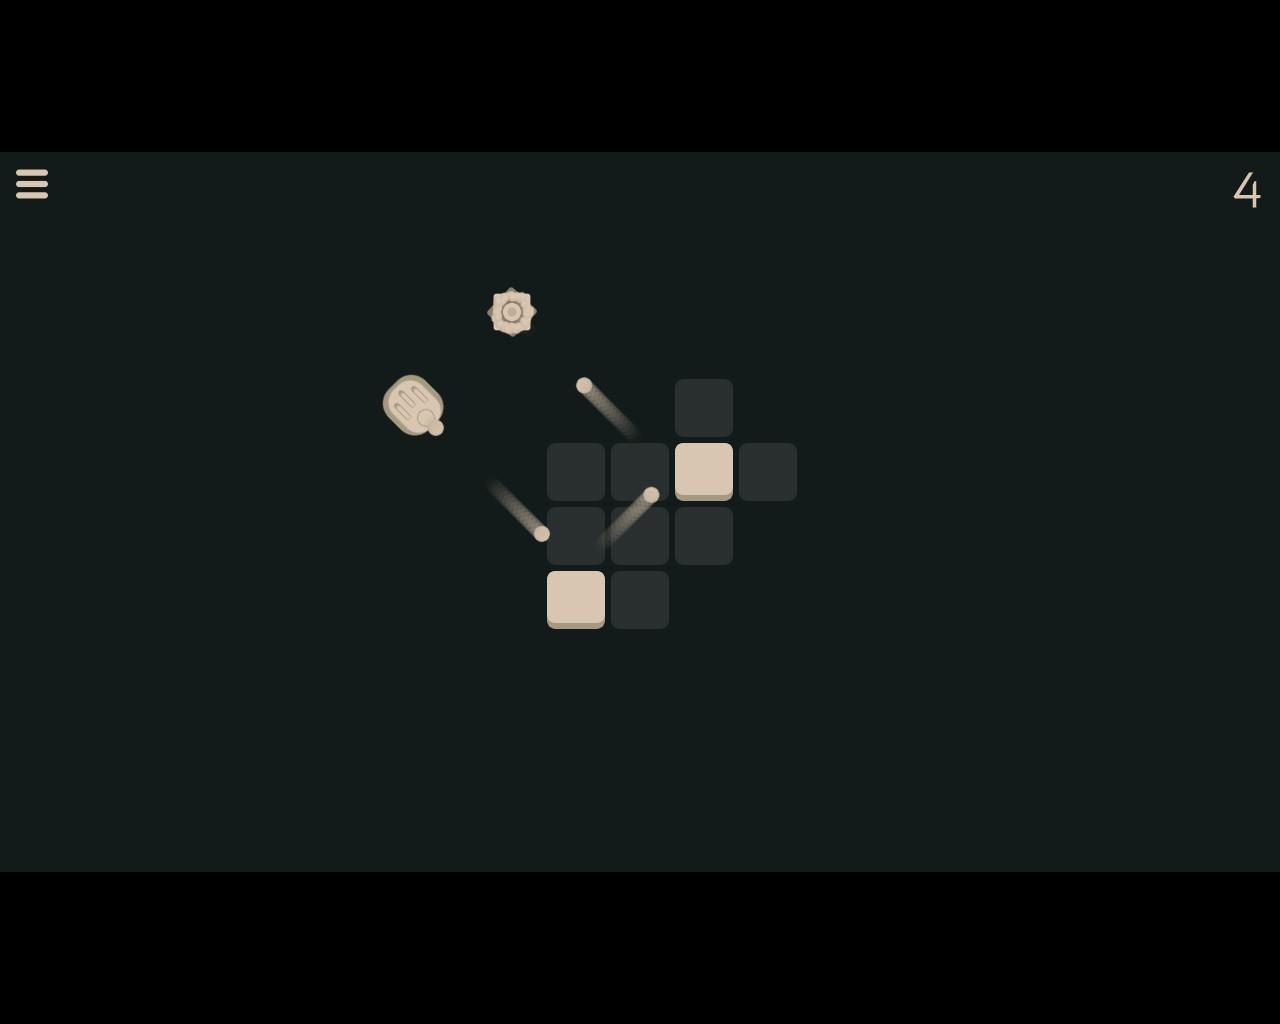 Blokker Walkthrough of All Puzzles Solution (24 Levels)